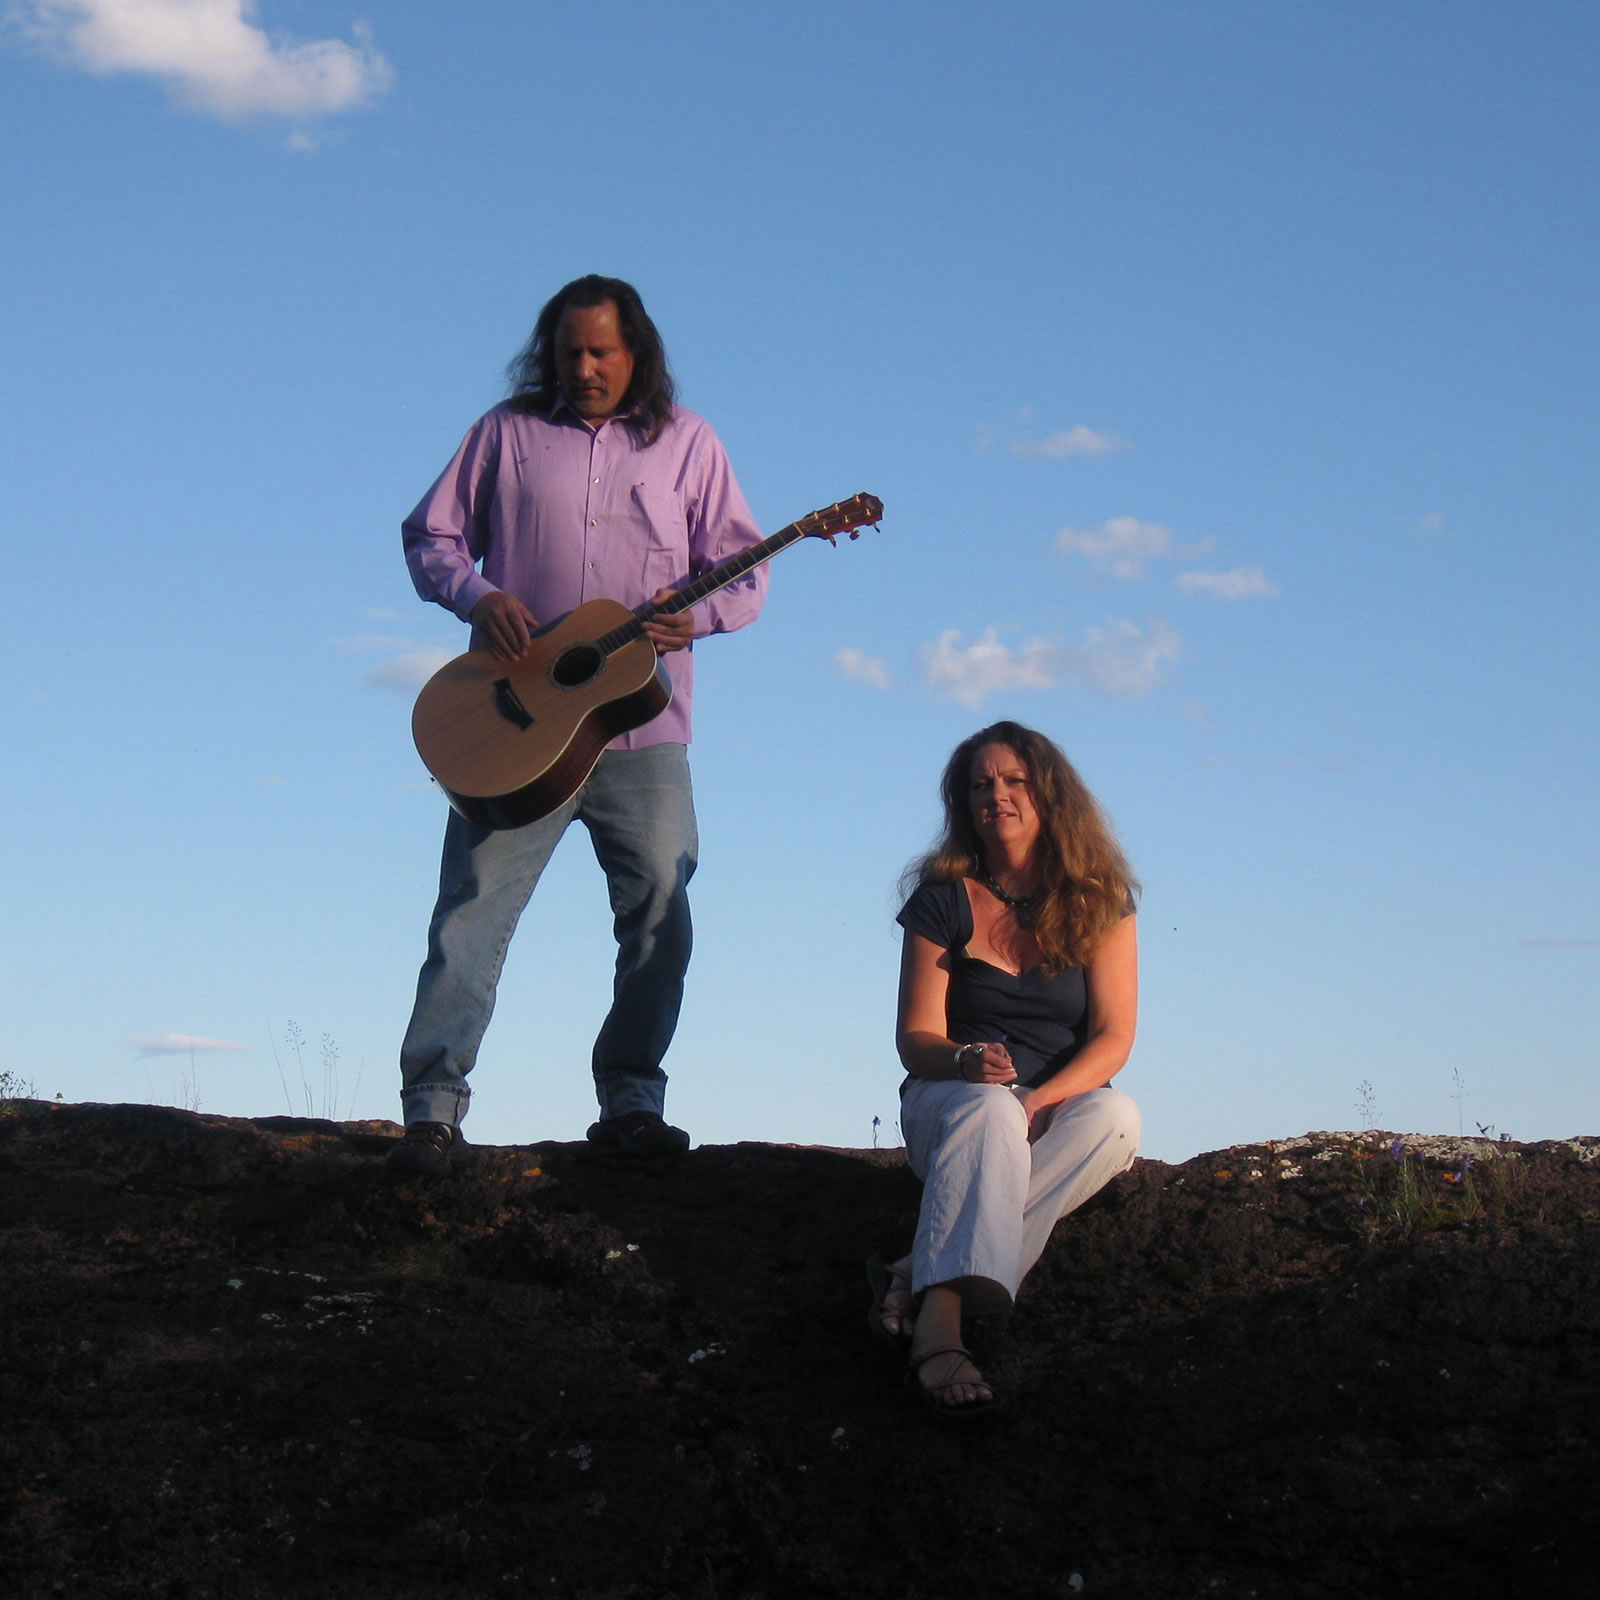 Roxann Berglund & Briand Morrison play The Roadhouse